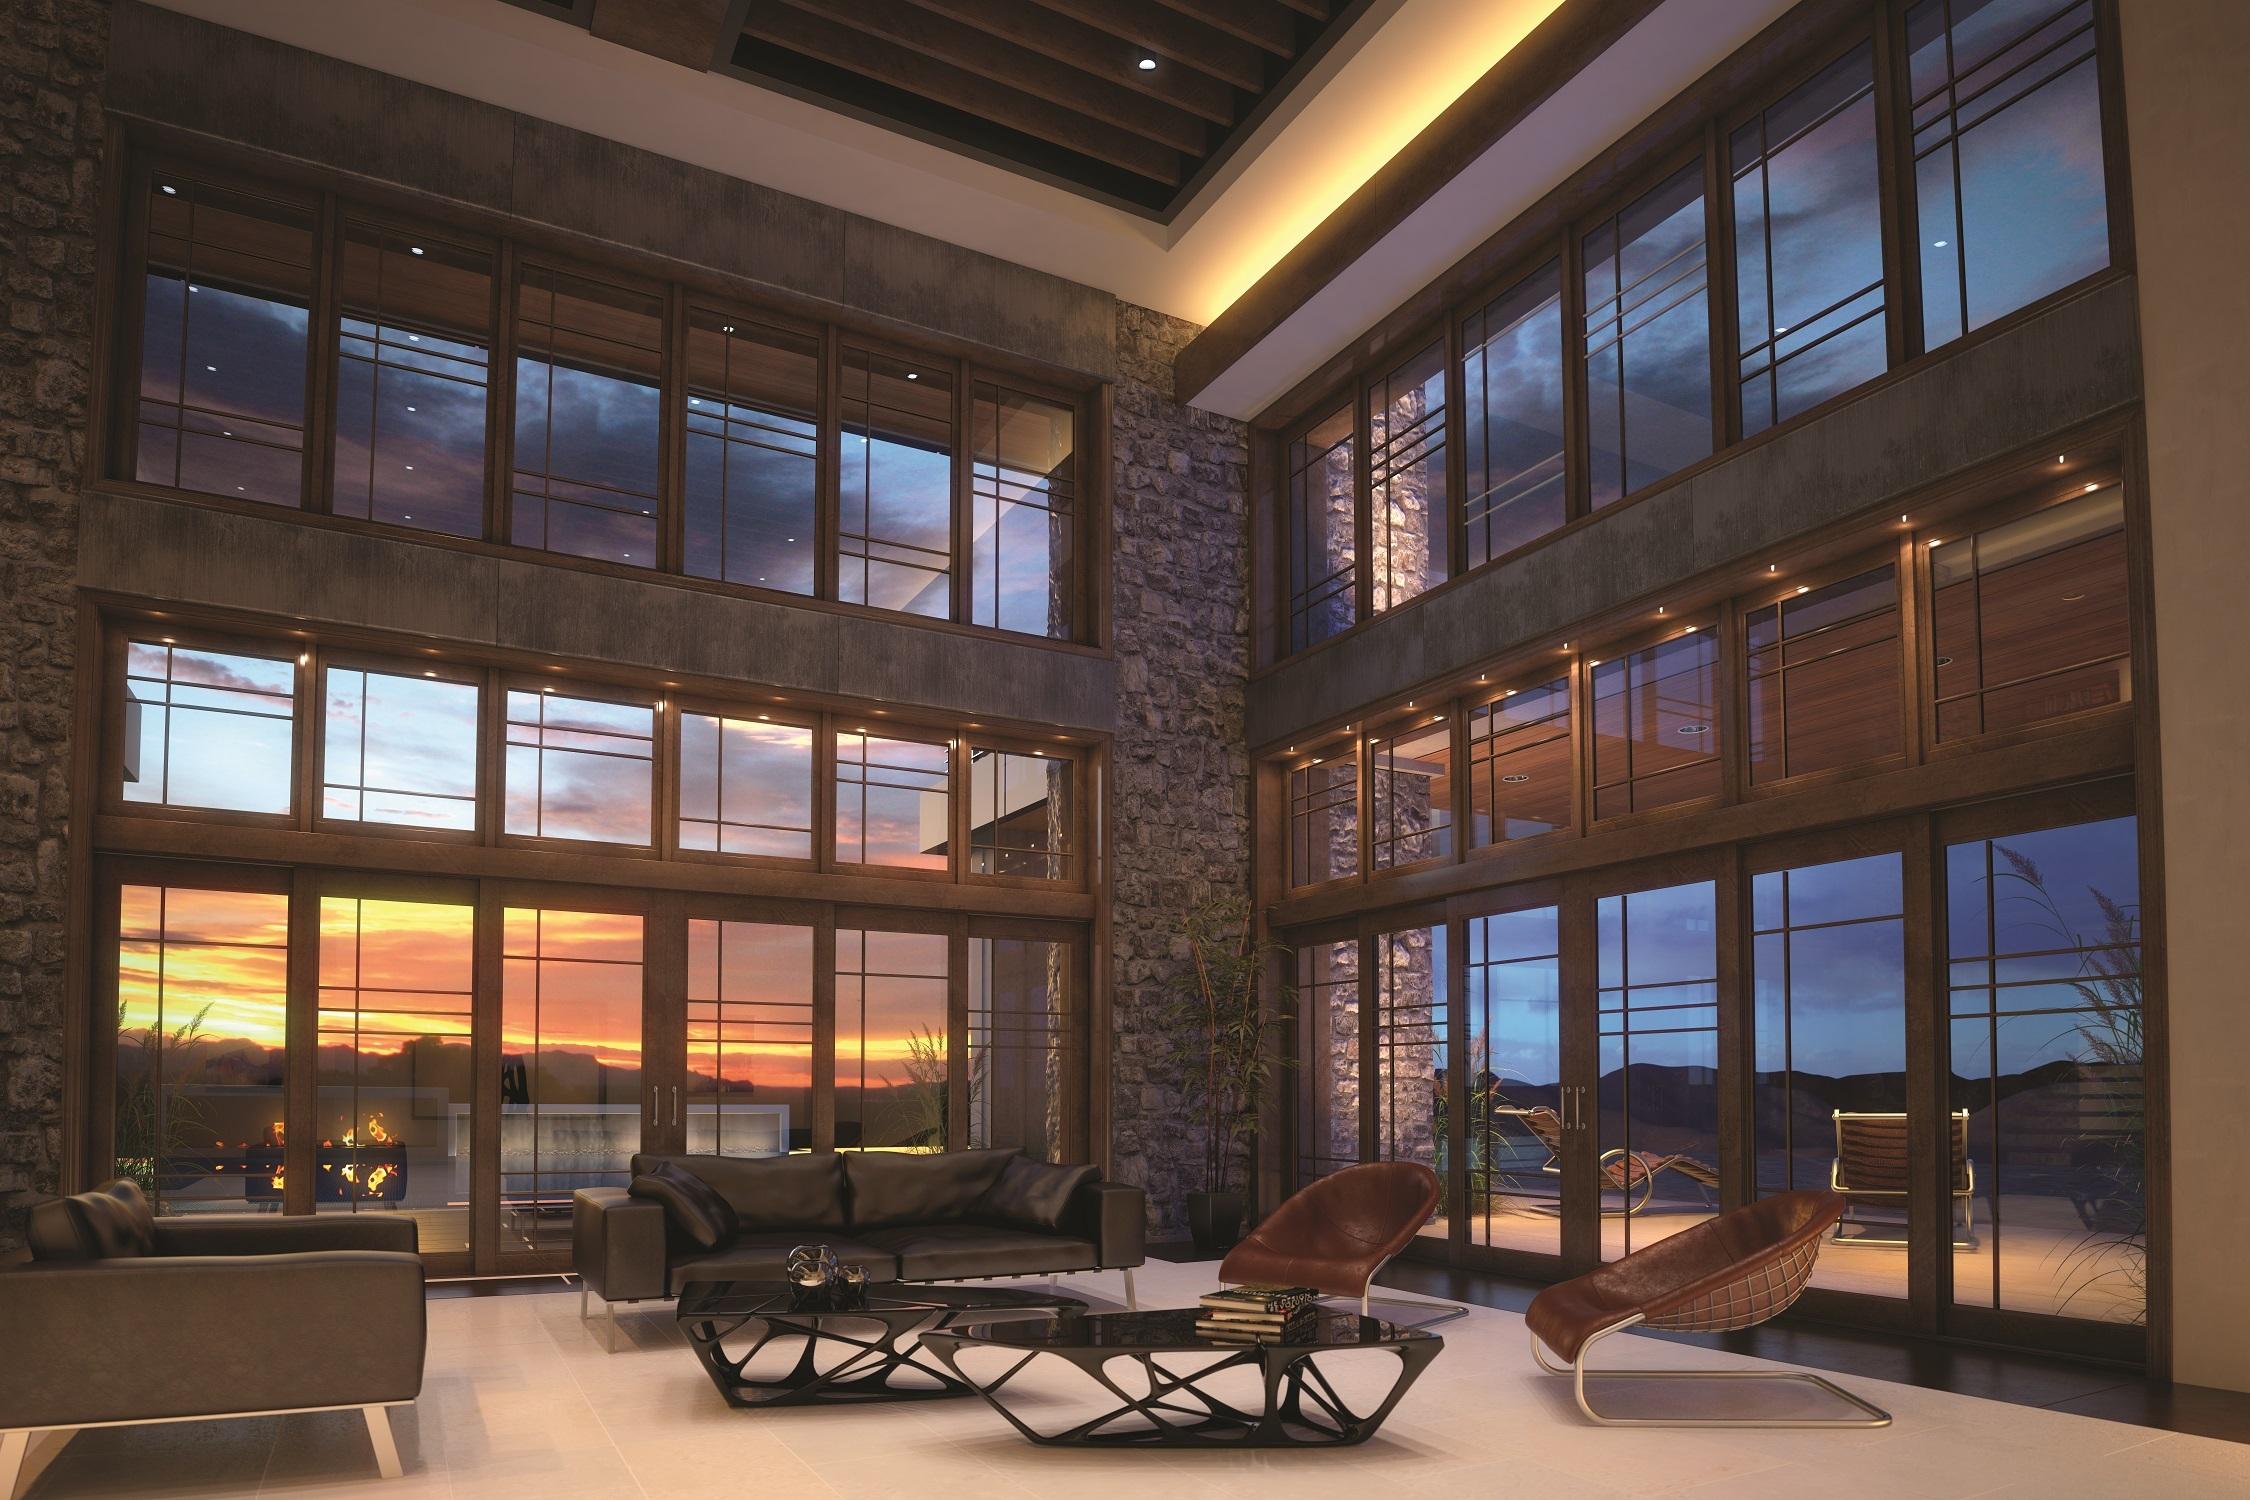 jeld wen window sizes full size stunning summer views business wire